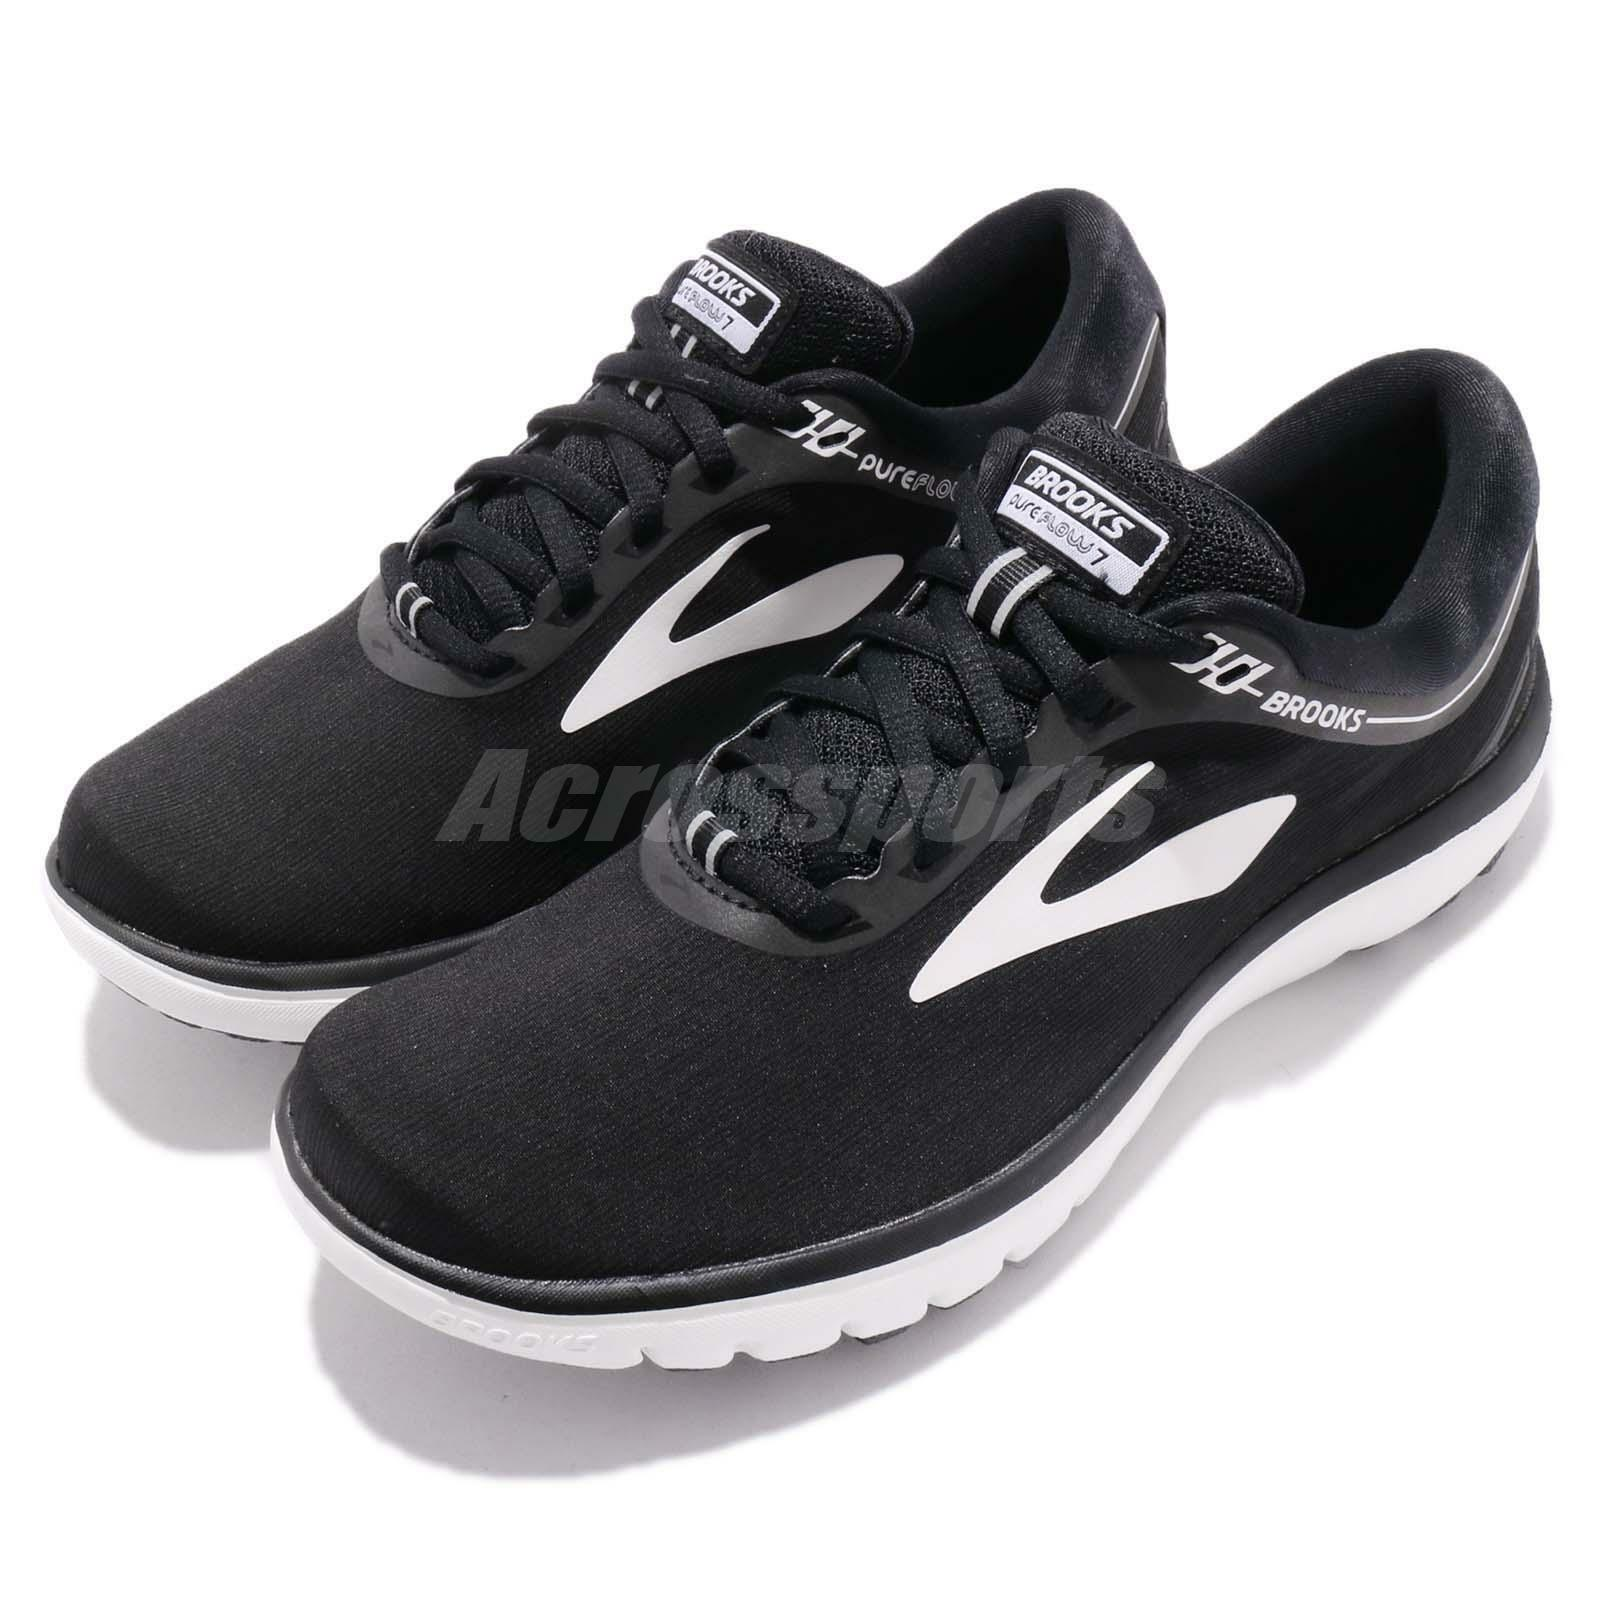 Brooks PureFlow 7 VII nero bianca donna Running scarpe scarpe da ginnastica 120262 1B